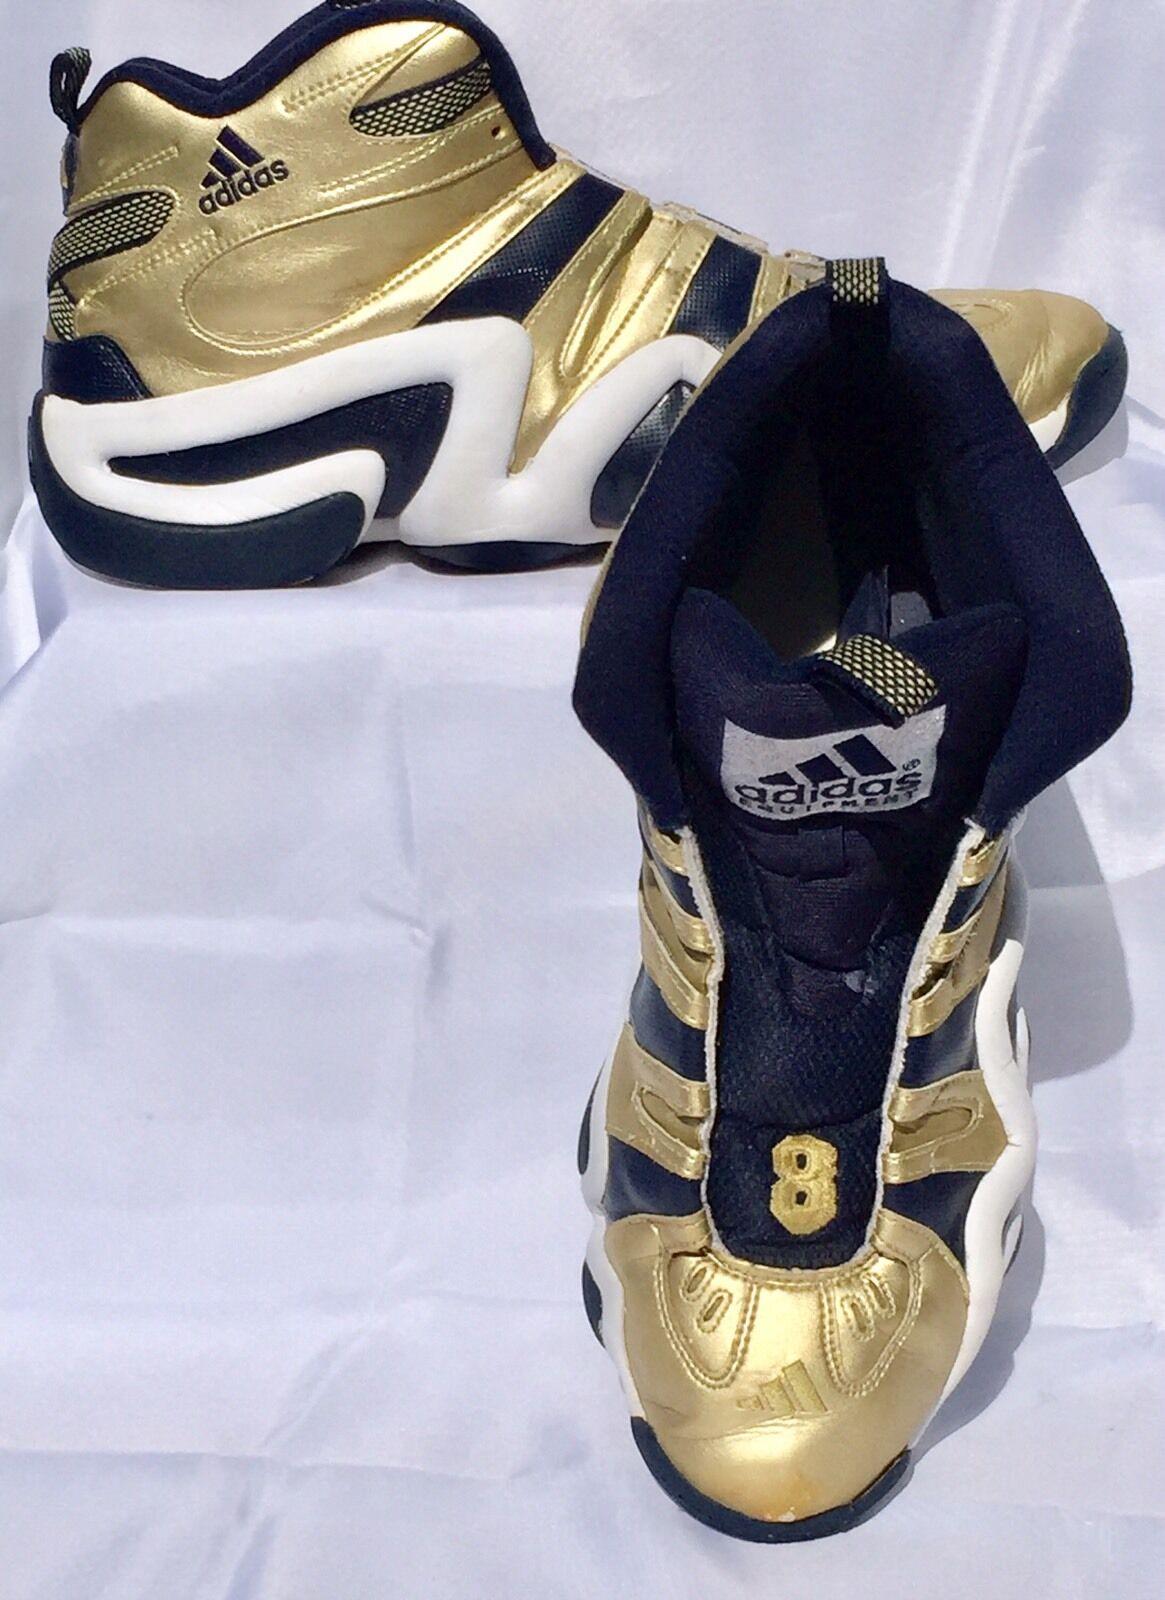 Adidas  Shoe Crazy 8 Notre Dame March Madness 11 Navy Gold Kobe Uomo 17